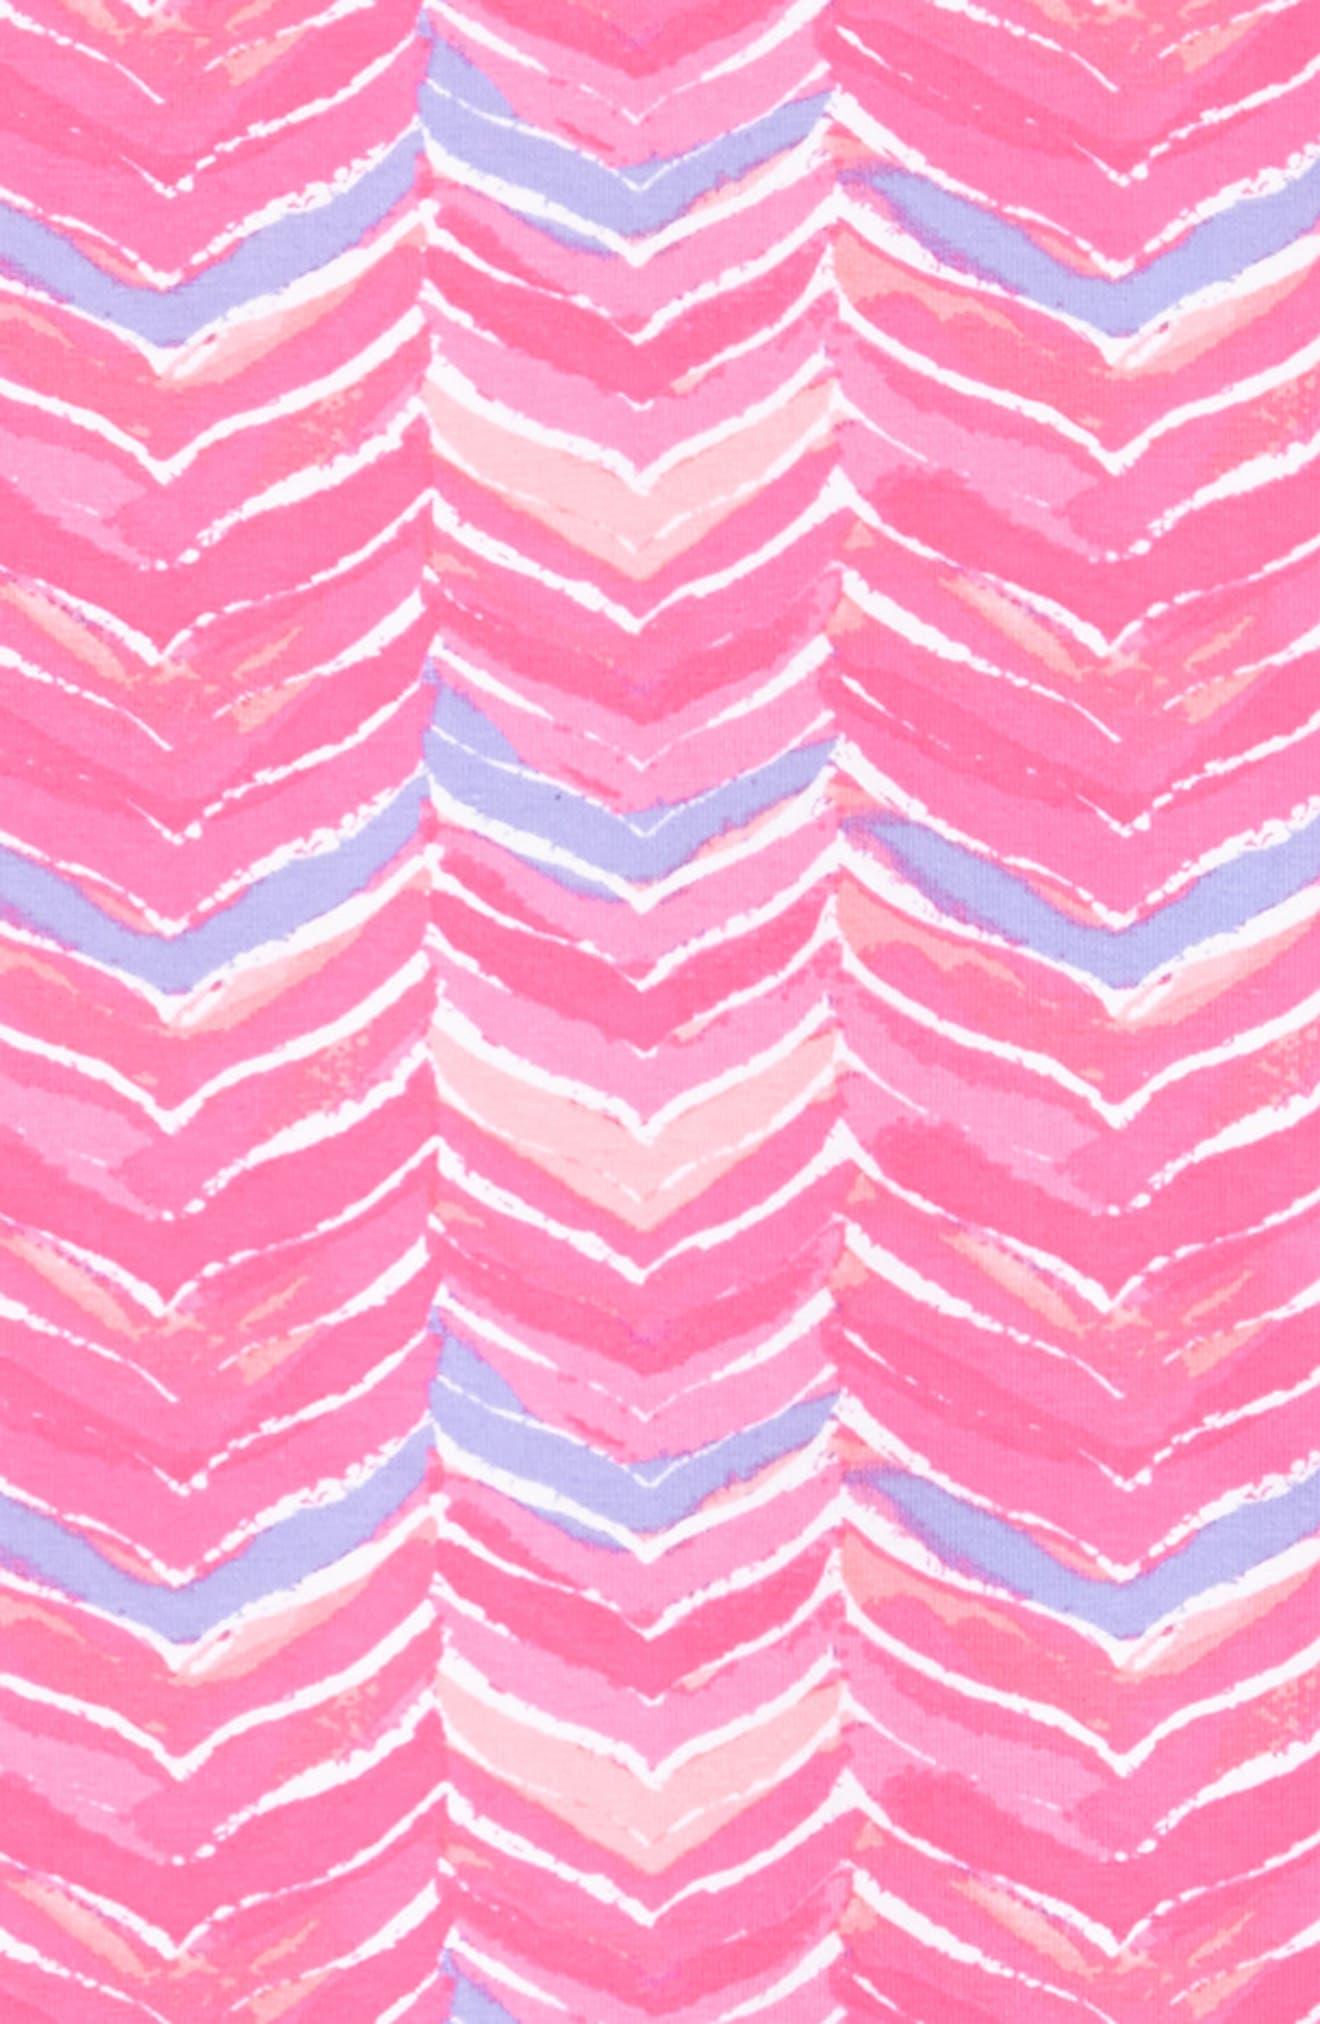 Watercolor Whale Tail Print Dress,                             Alternate thumbnail 3, color,                             Pink Sherbet